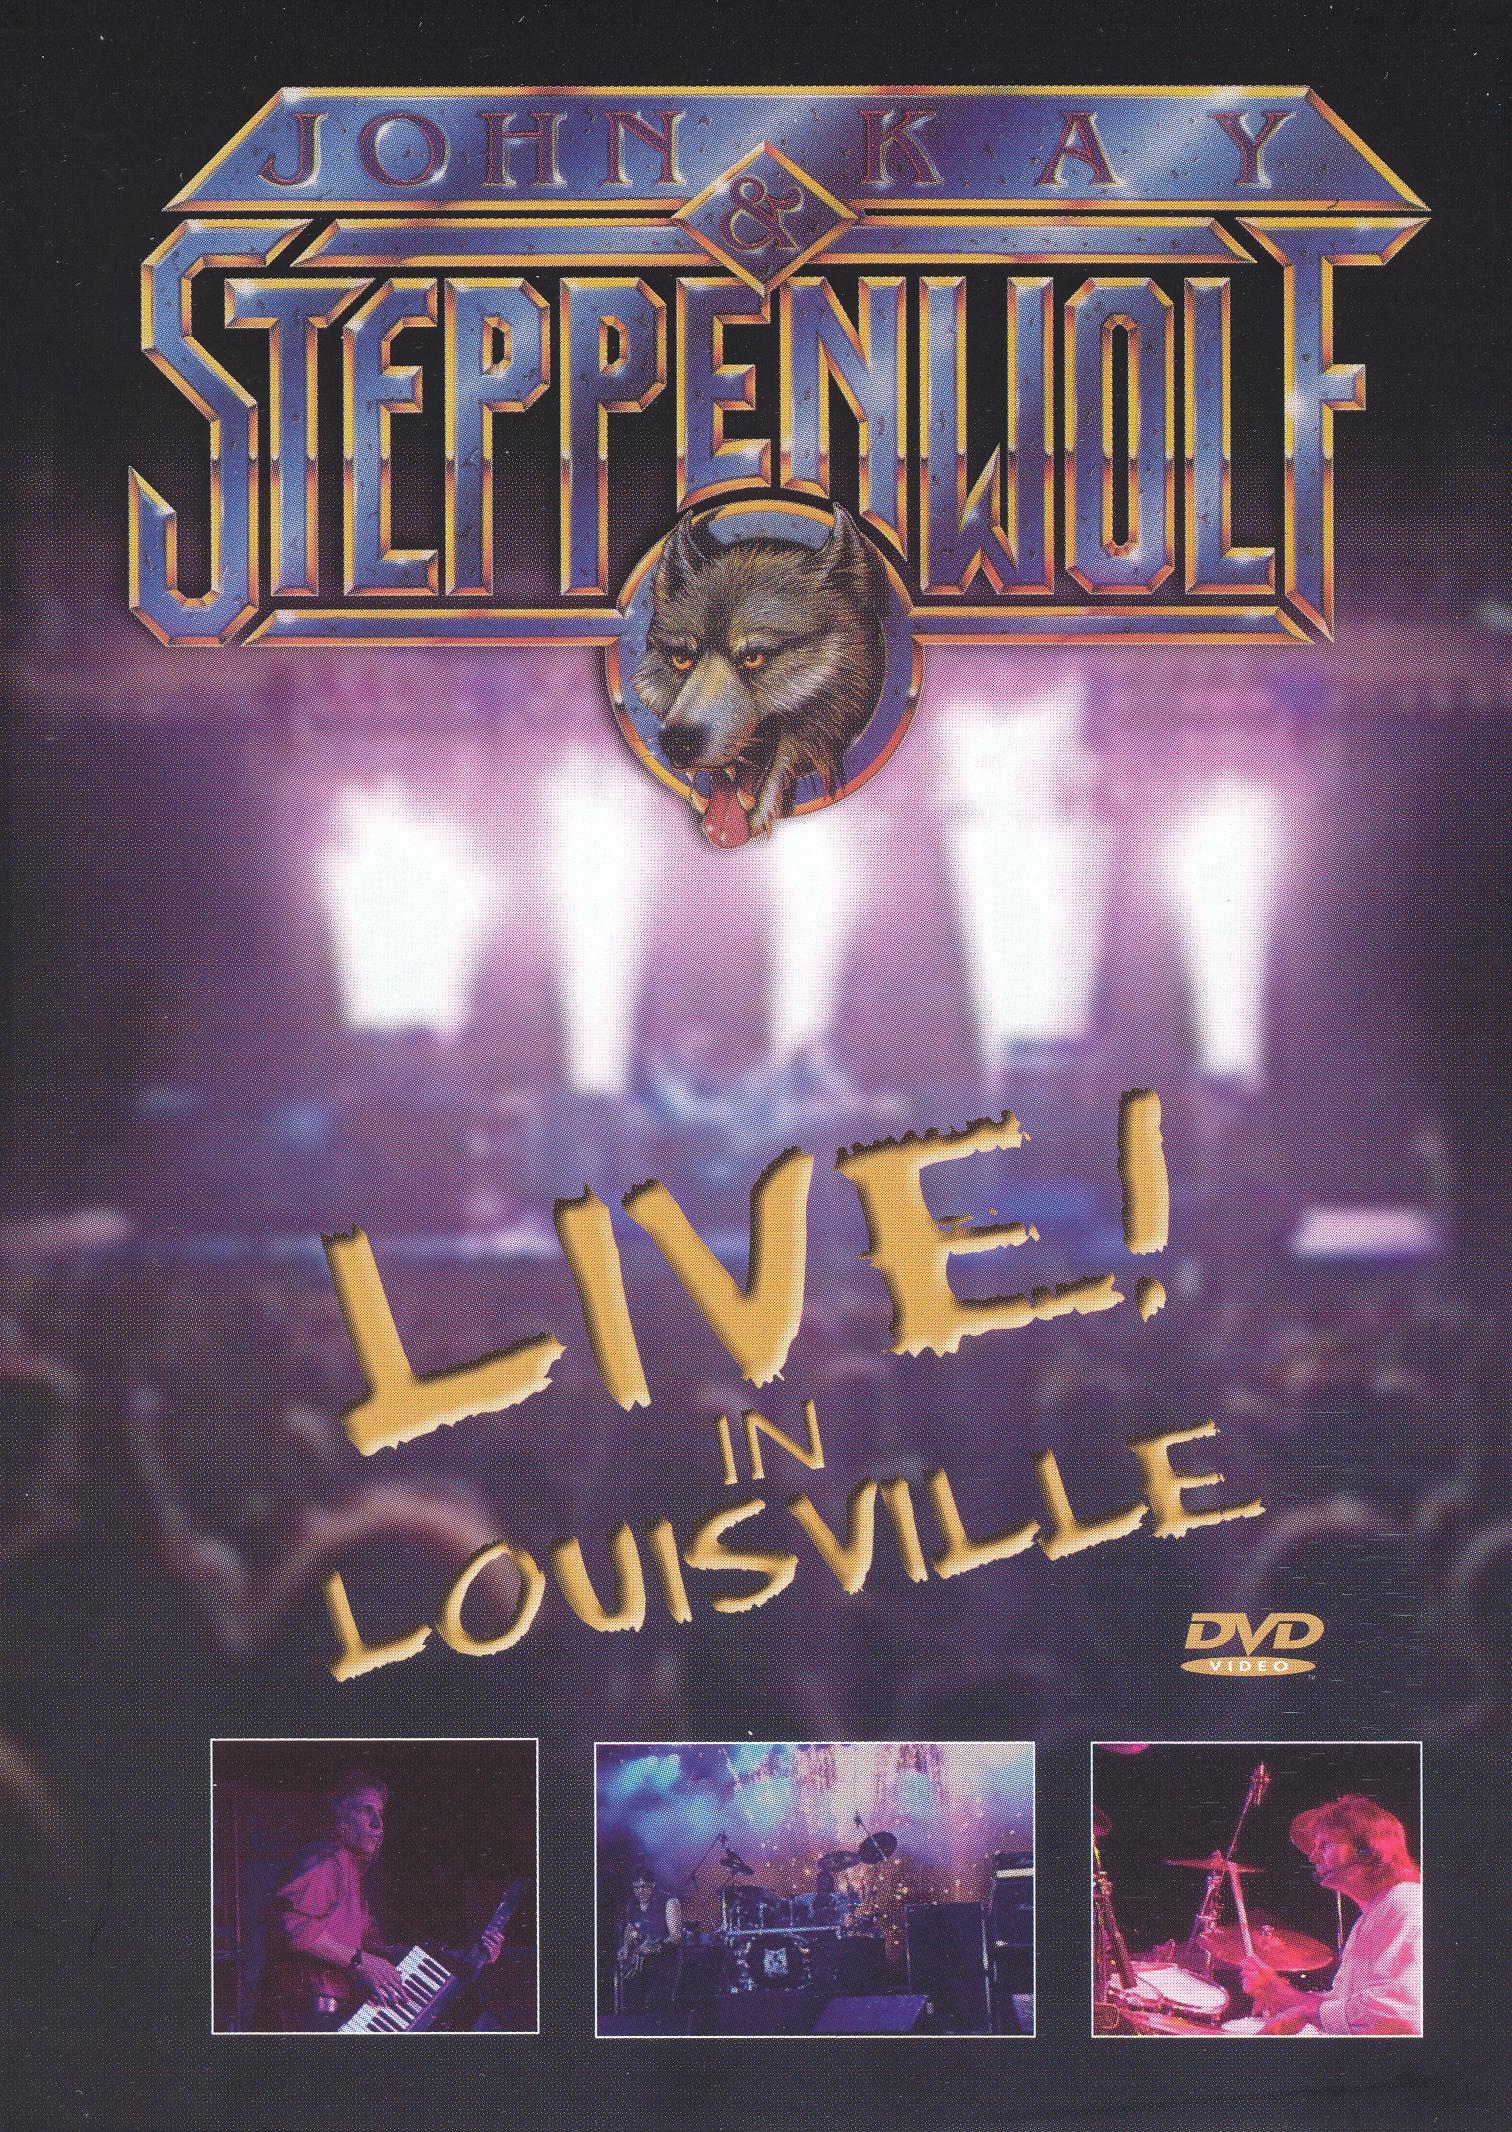 John Kay & Steppenwolf: Live in Louisville